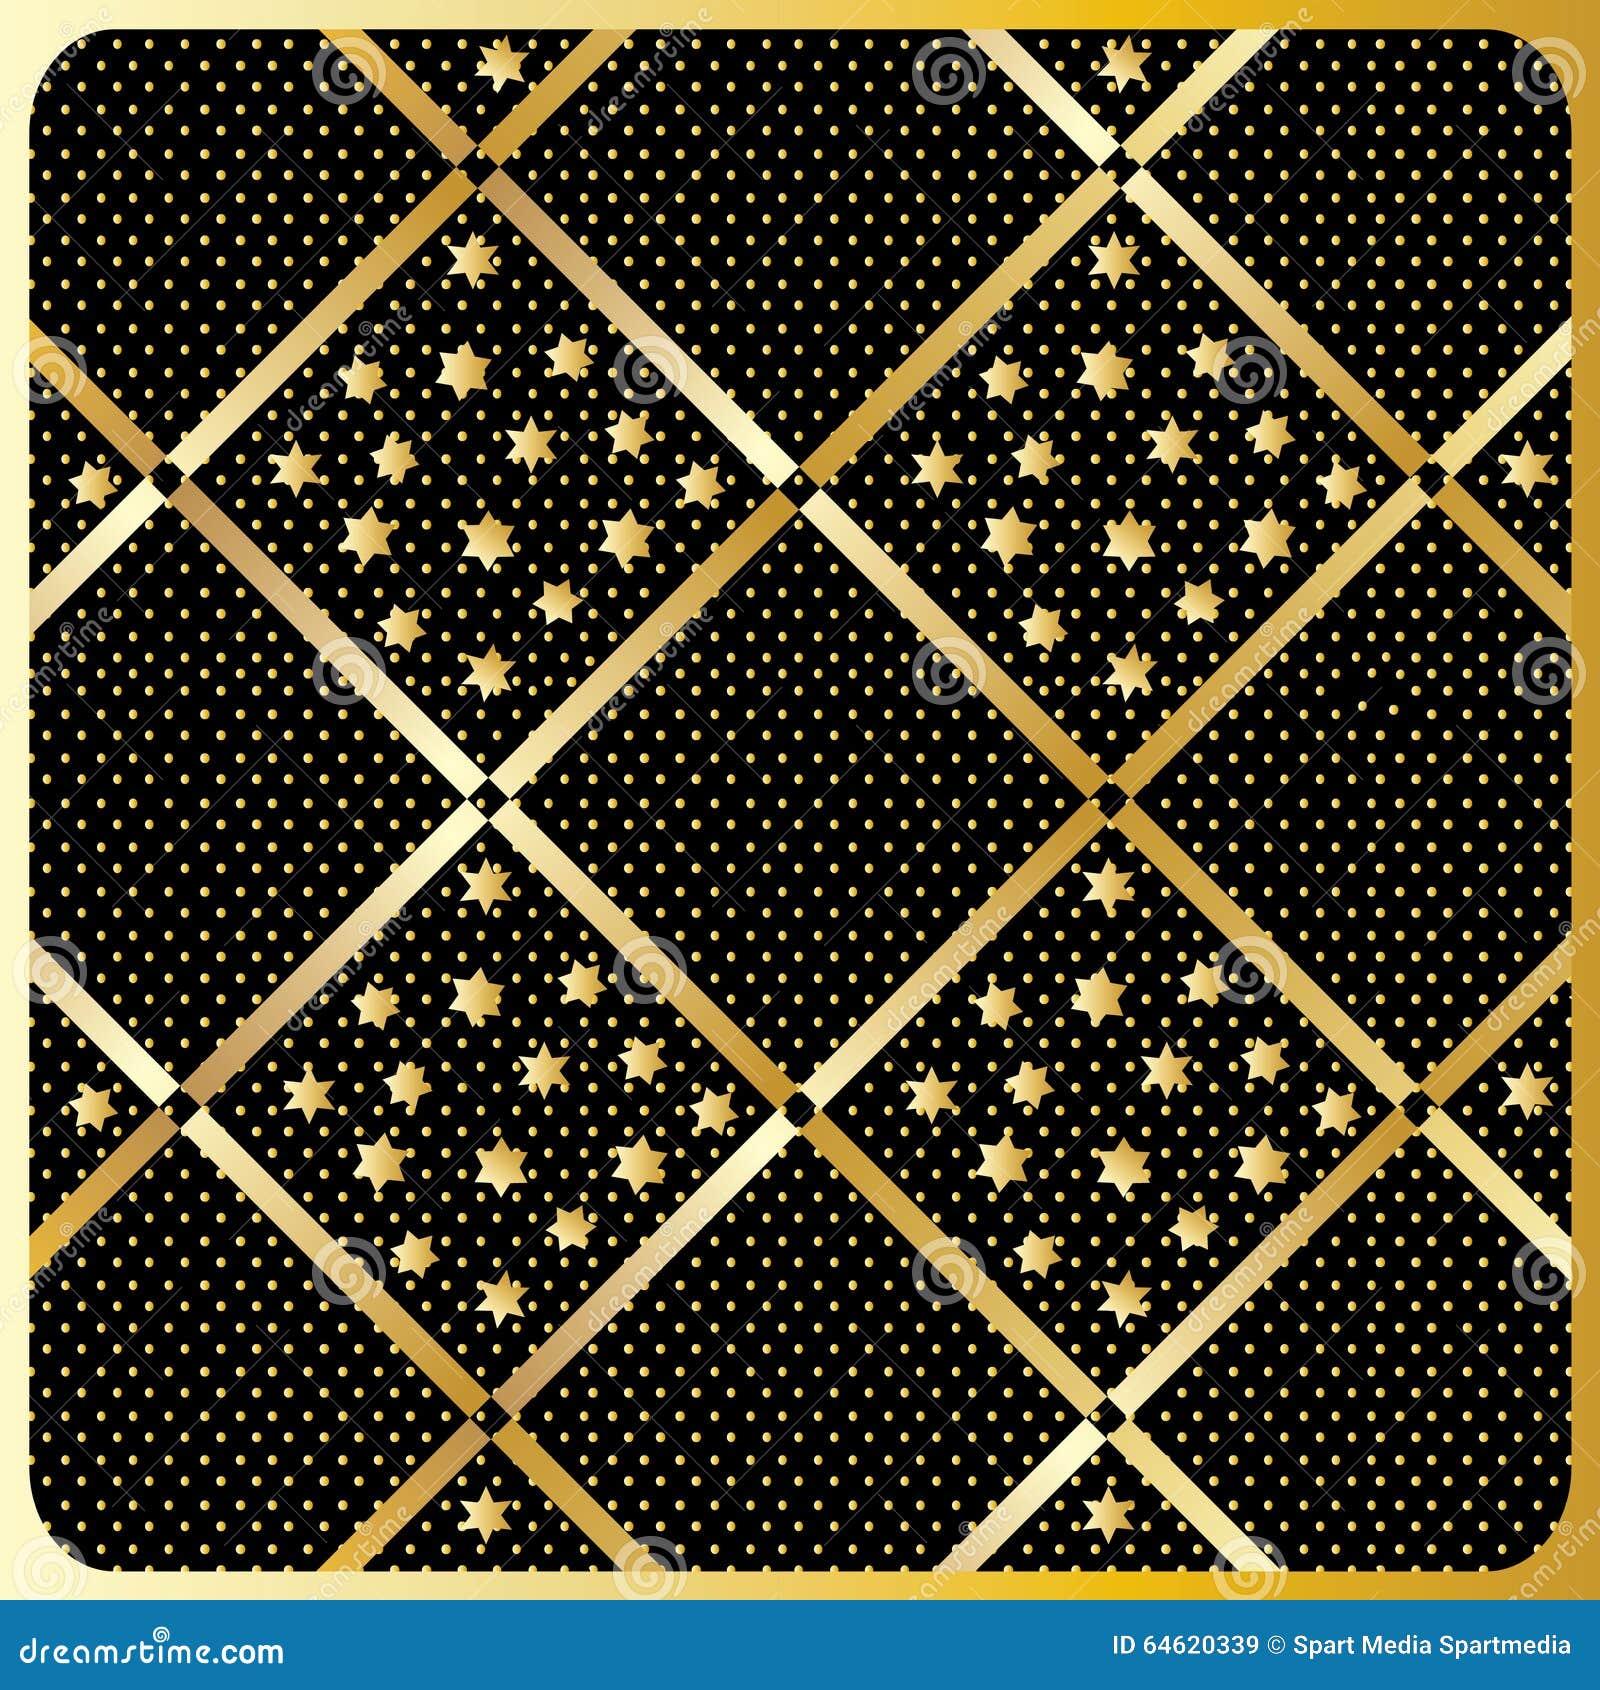 black diamond pattern background wwwimgkidcom the